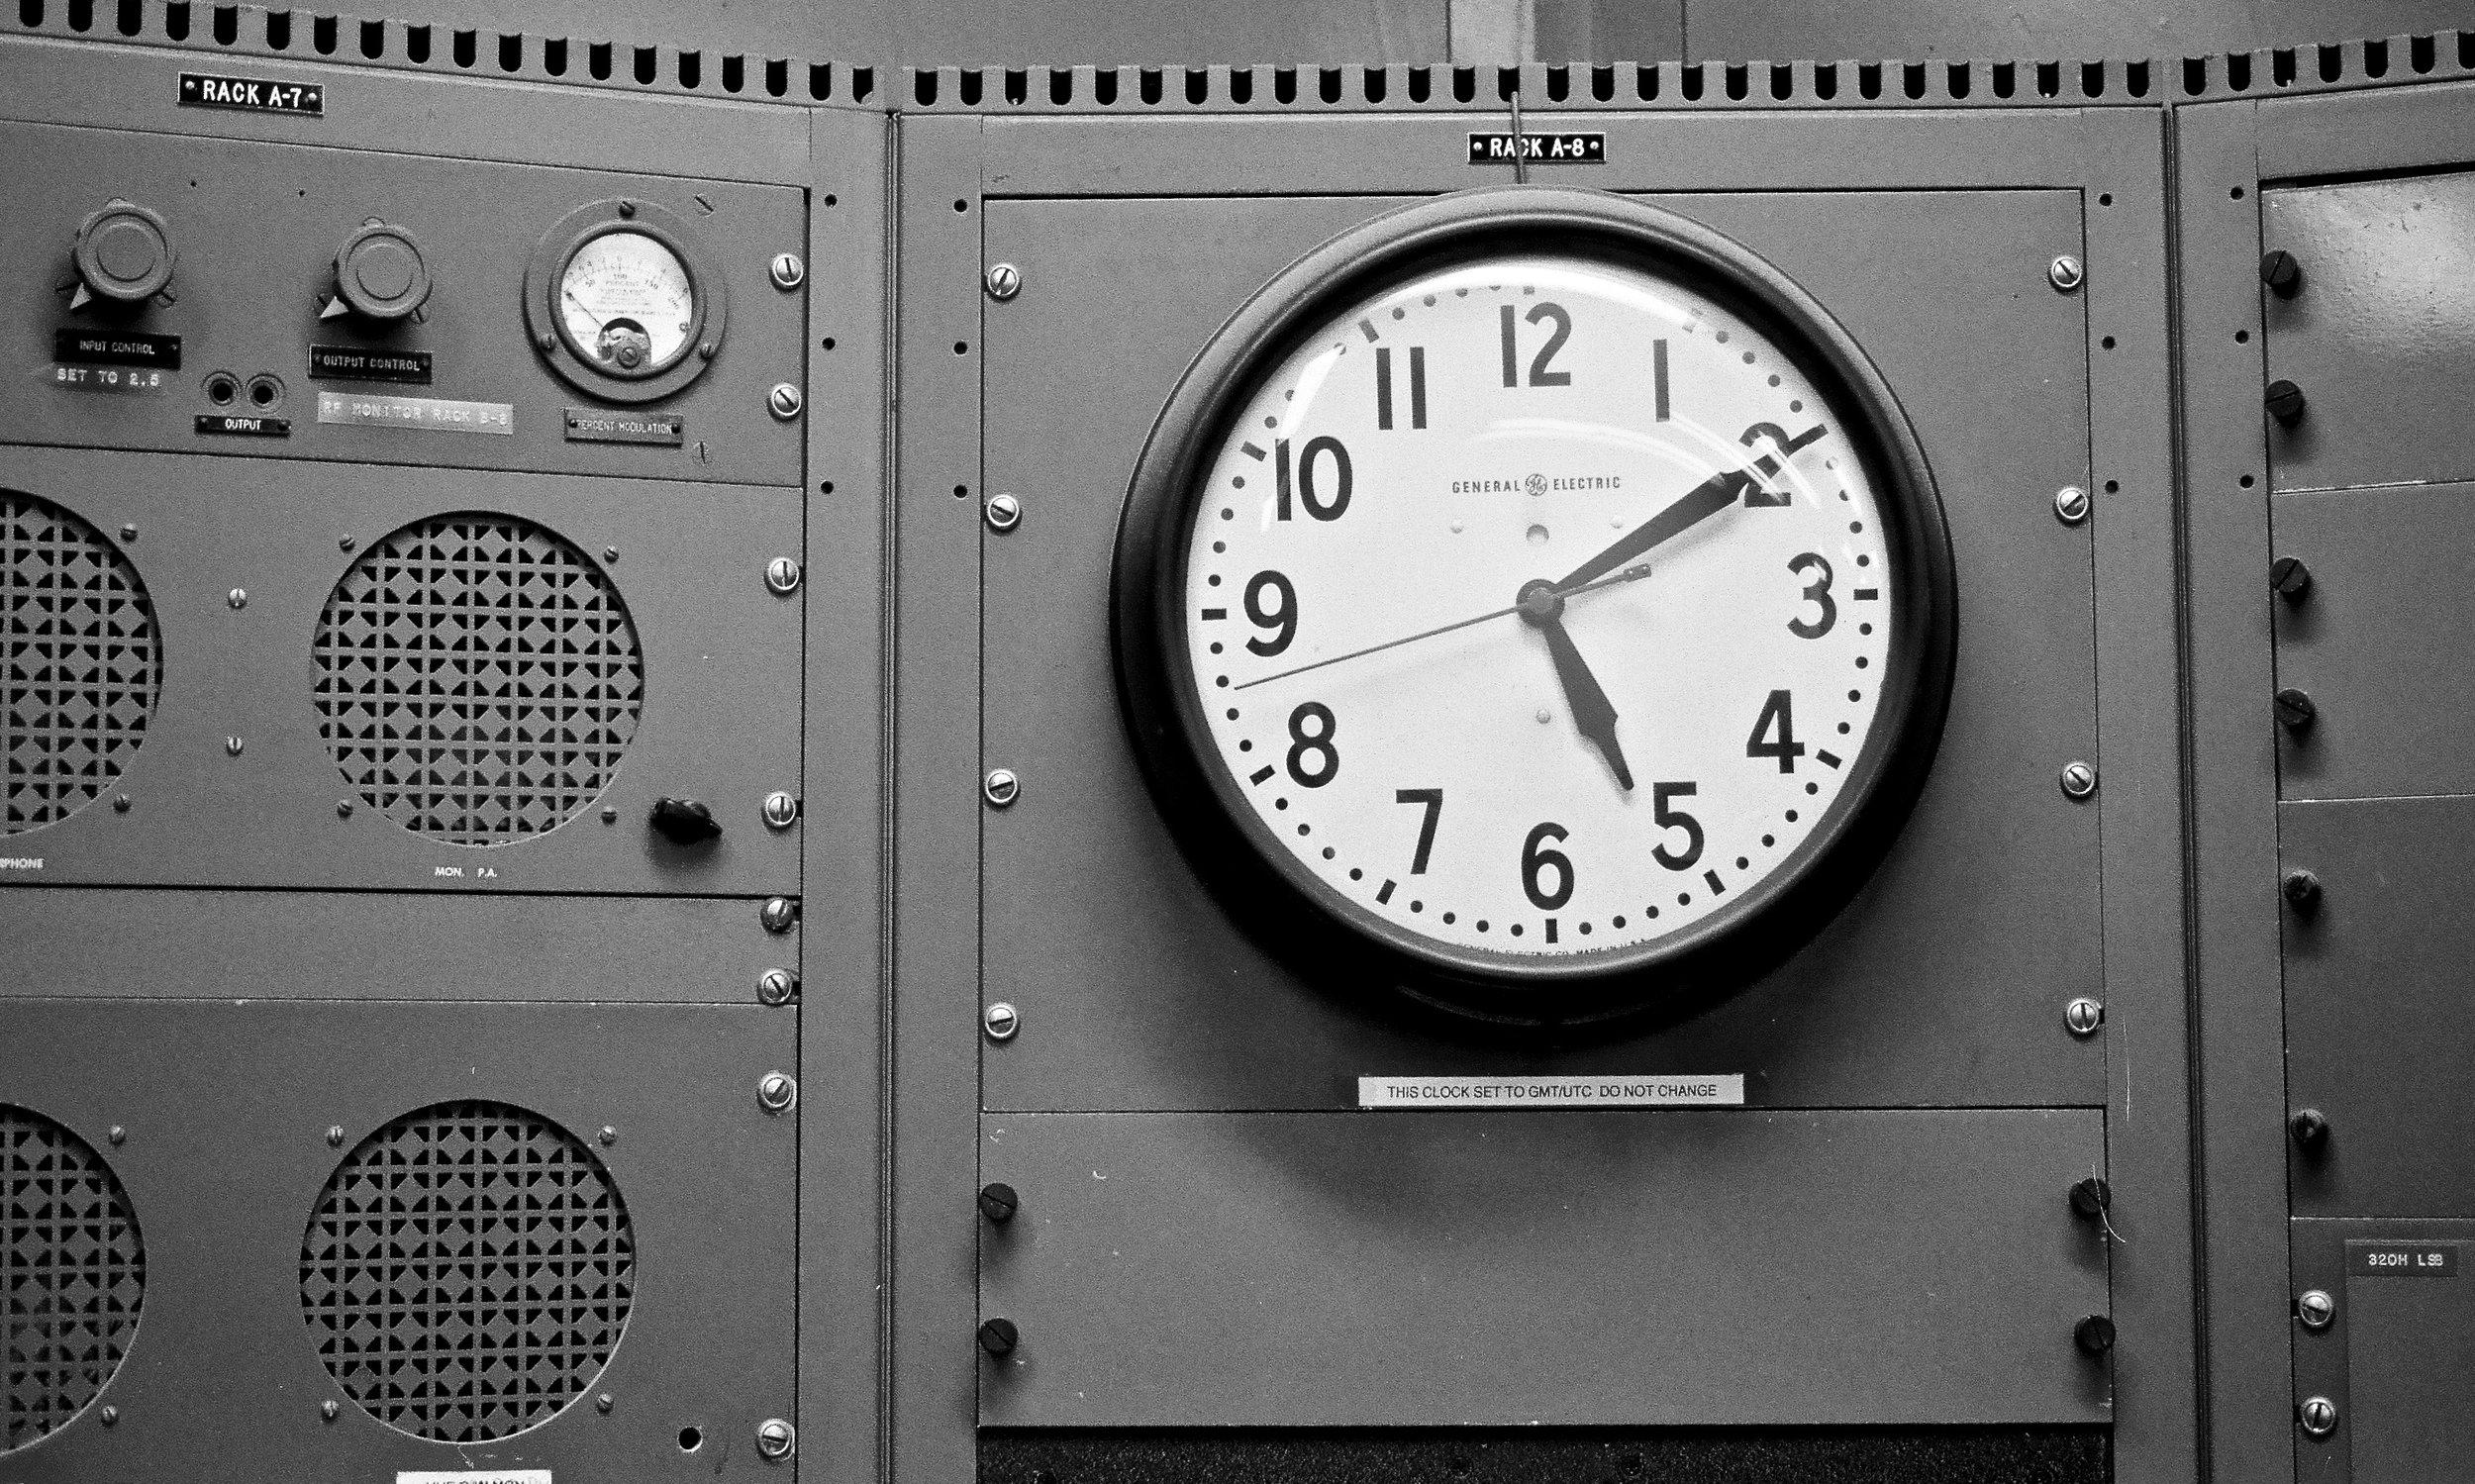 Clock in the master control room at coastal wireless station KPH in Bolinas, CA (Nikon FM2n on Kodak Tmax 400)